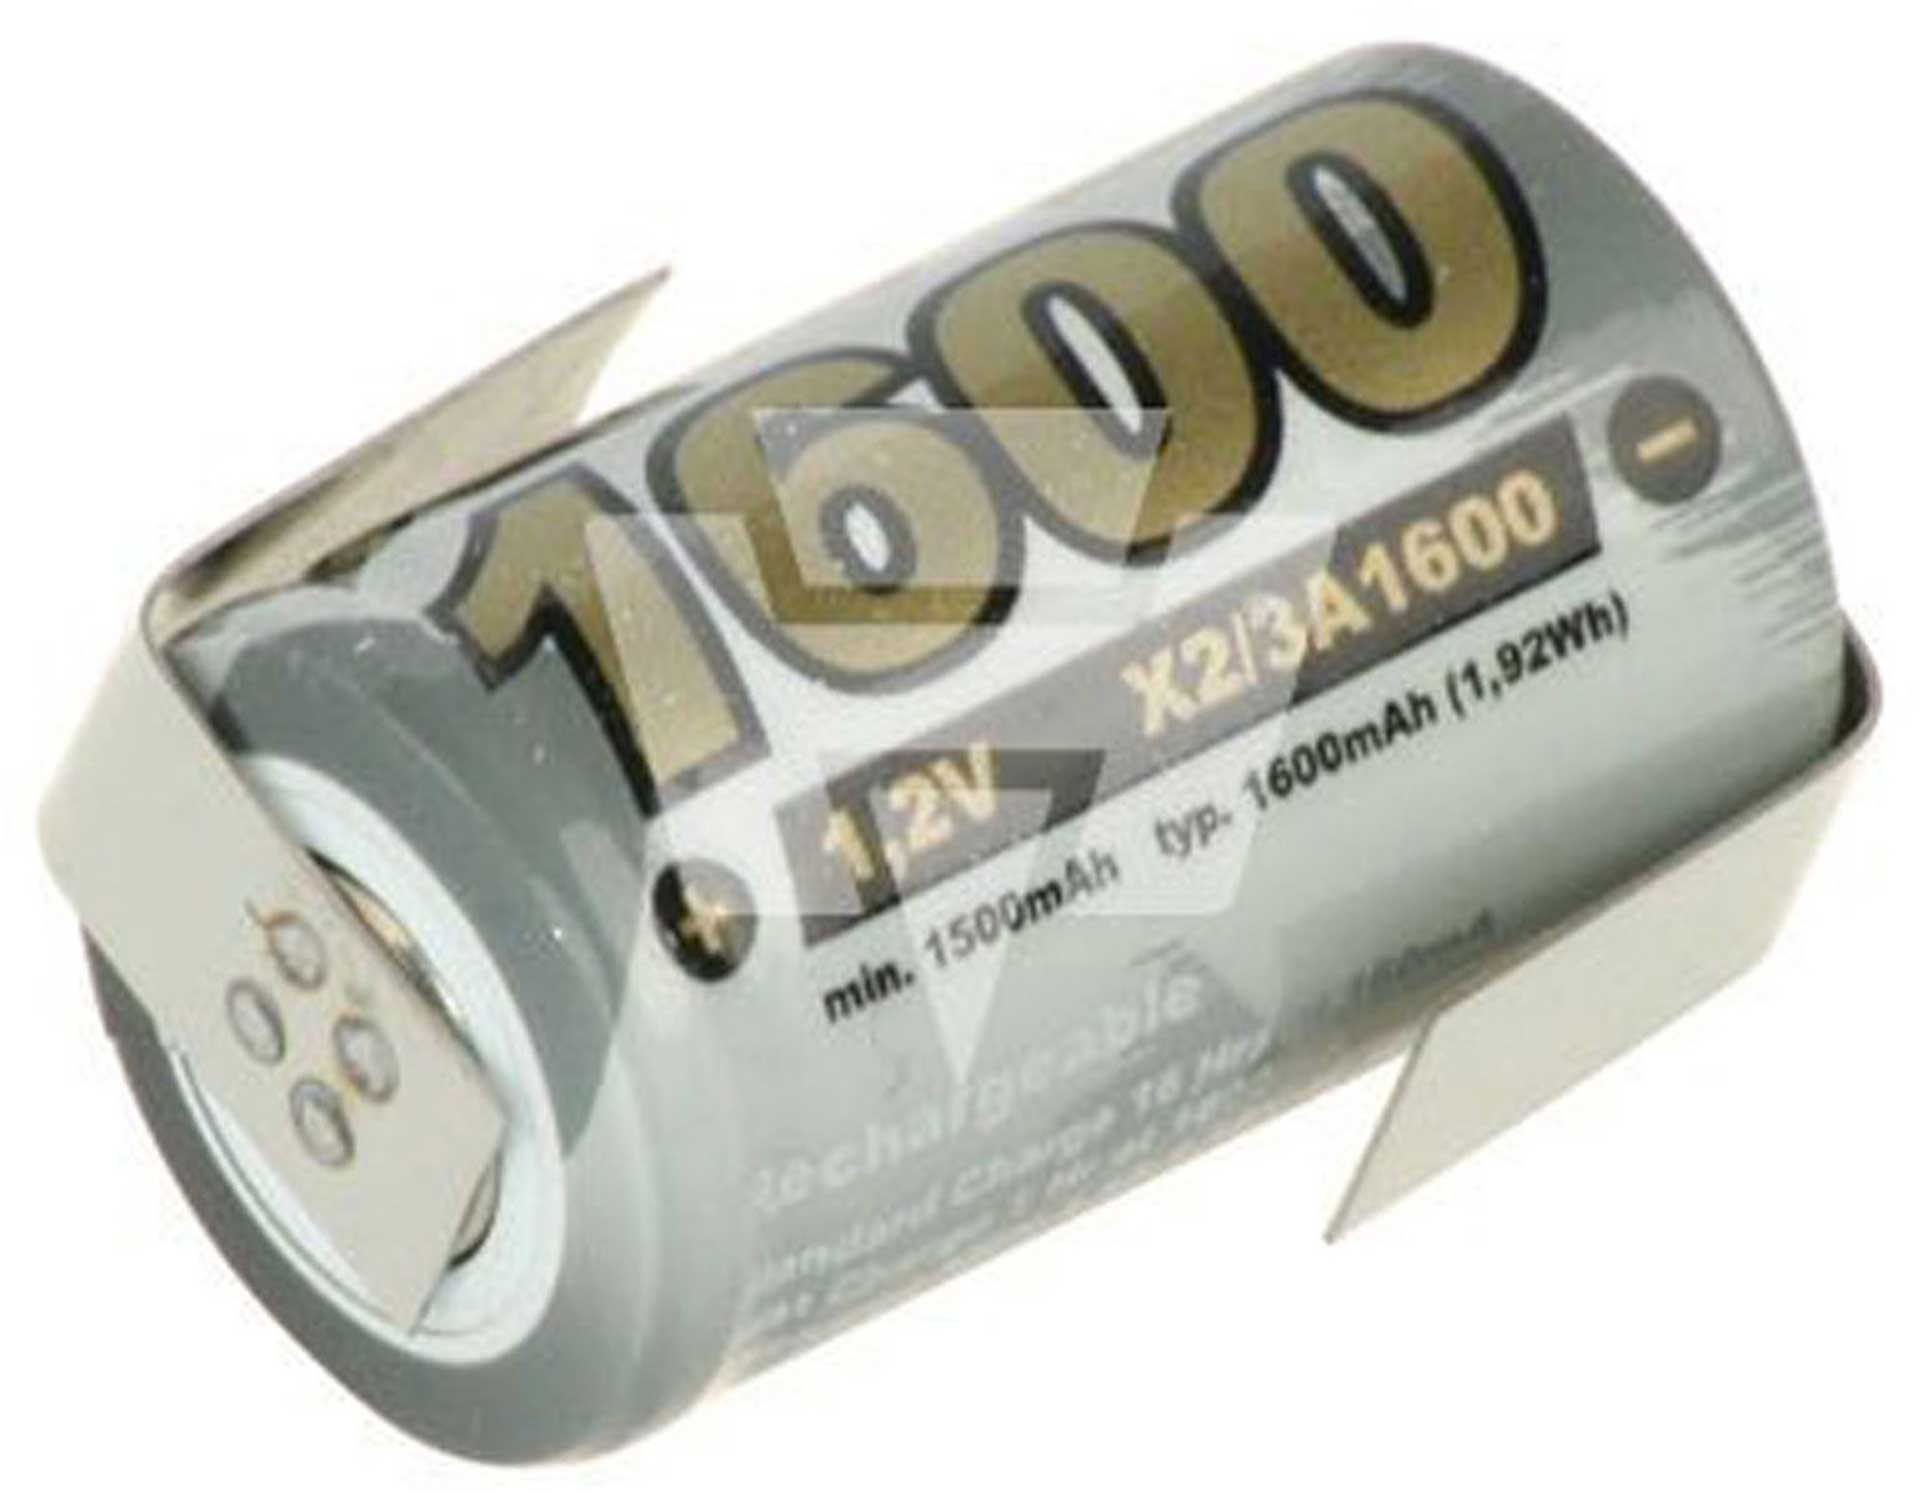 XCELL 2/3A NI-MH 1,2V 1600MAH +LF